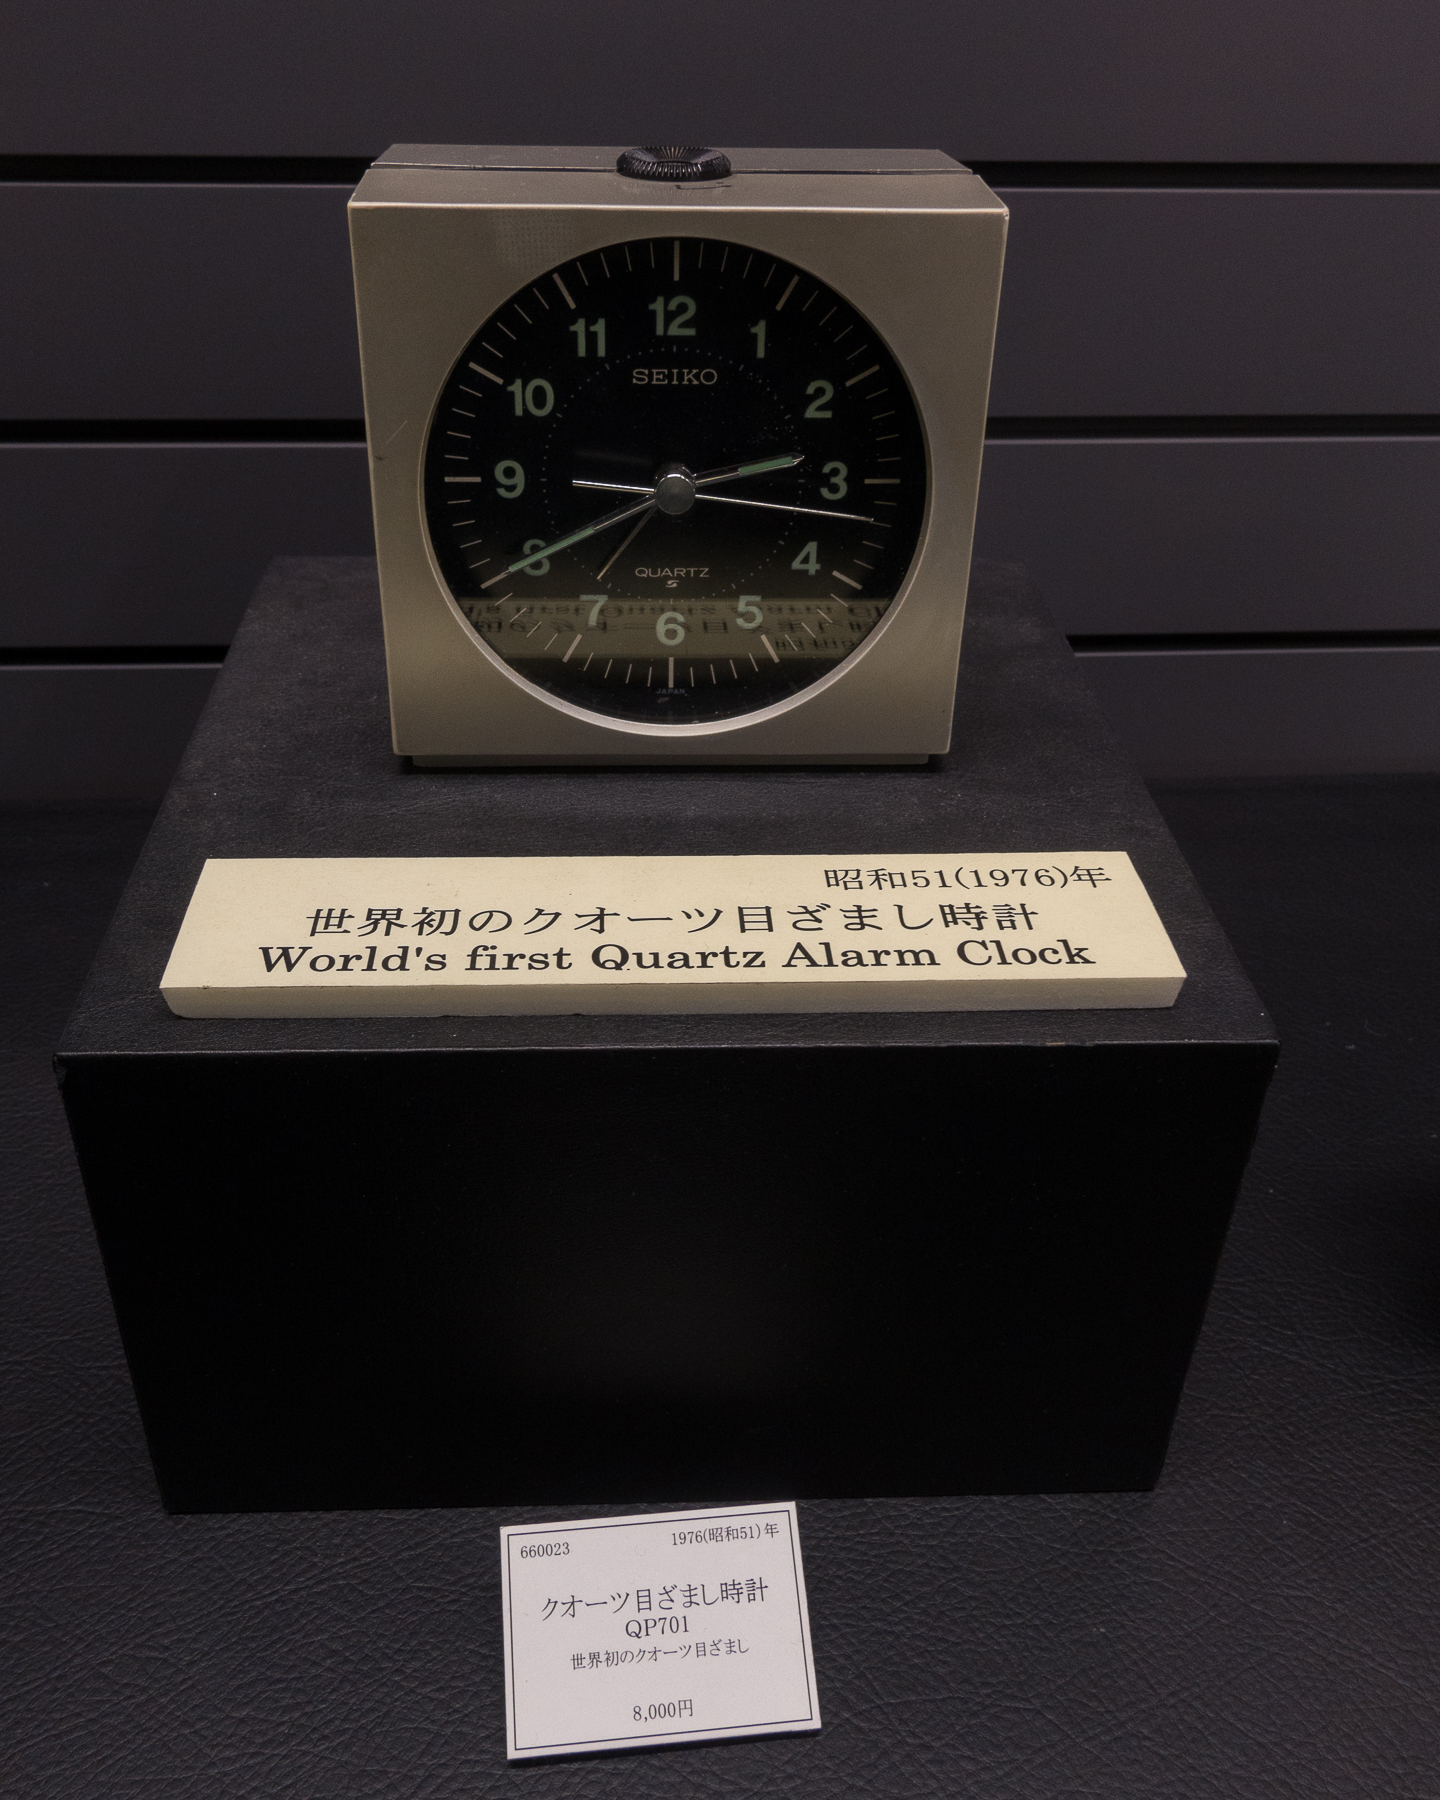 World's First Quartz Alarm Clock